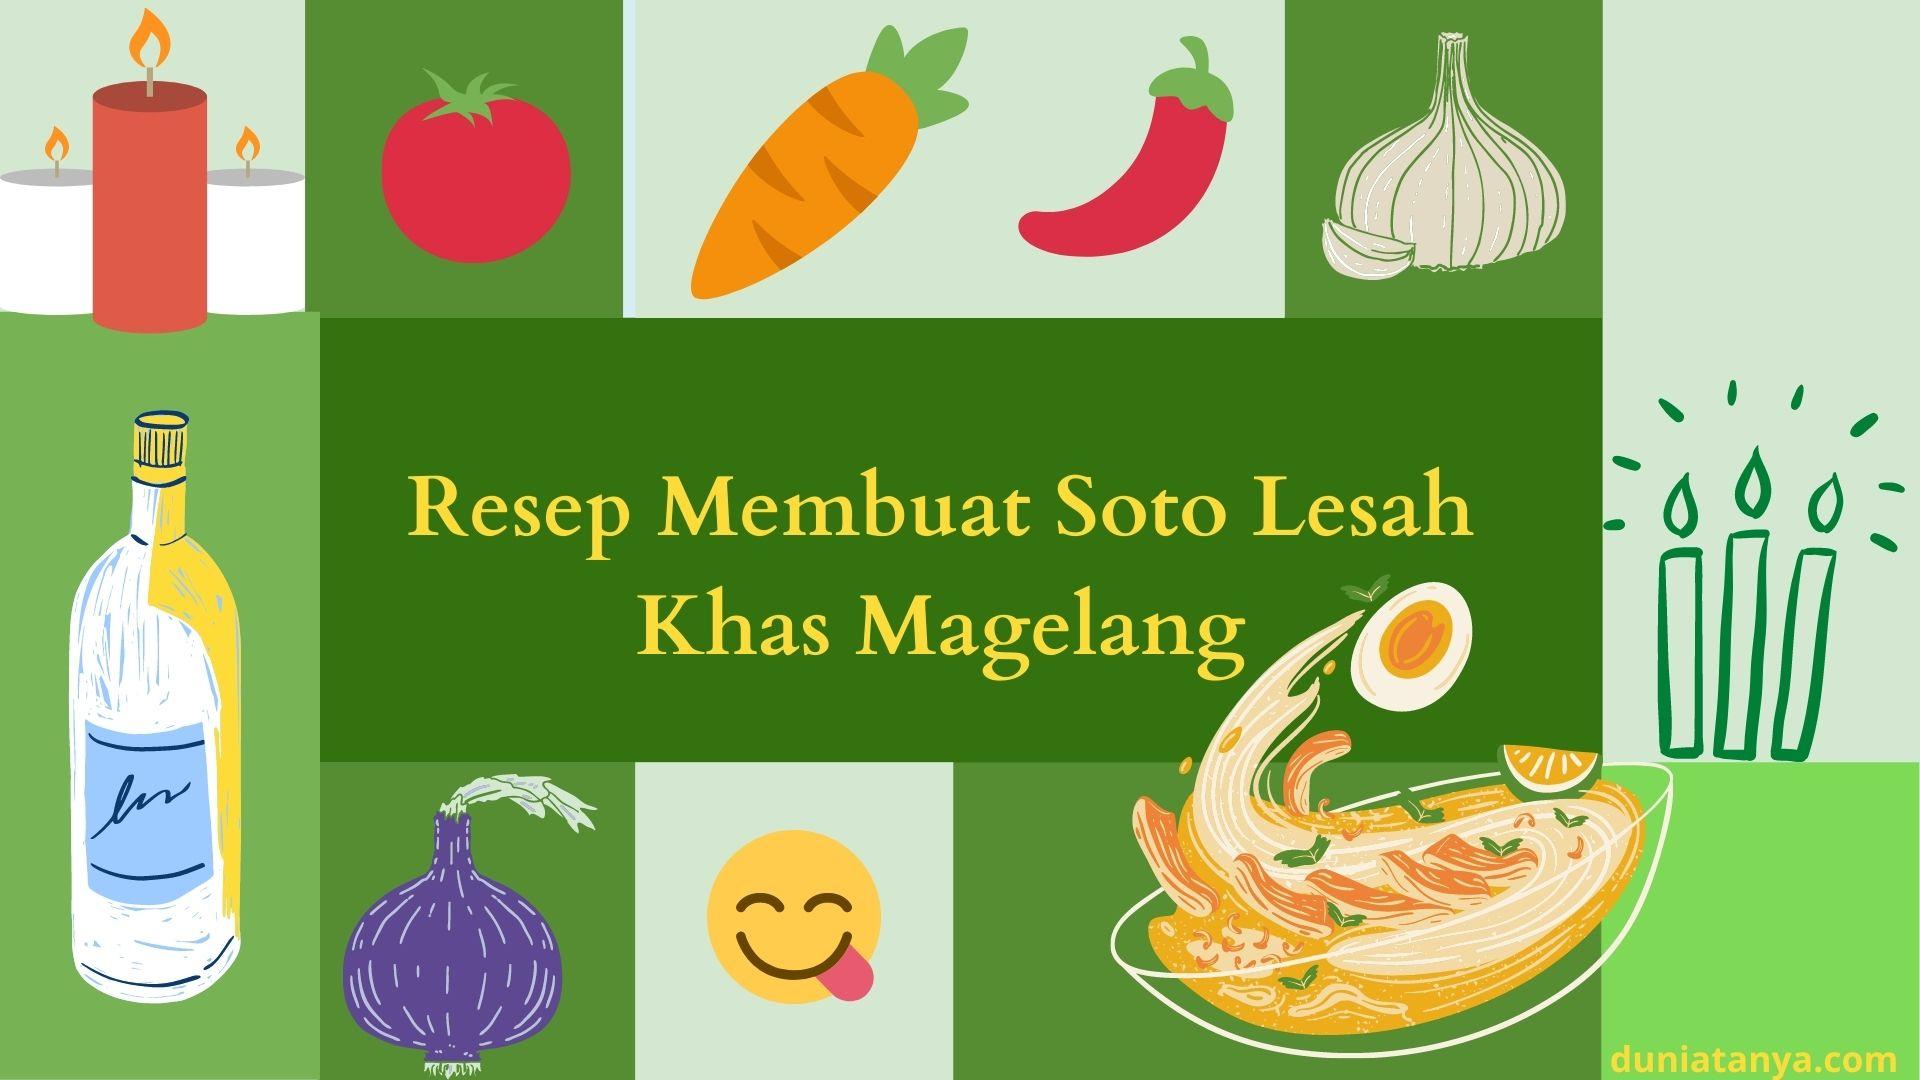 Read more about the article Resep Membuat Soto Lesah Khas Magelang